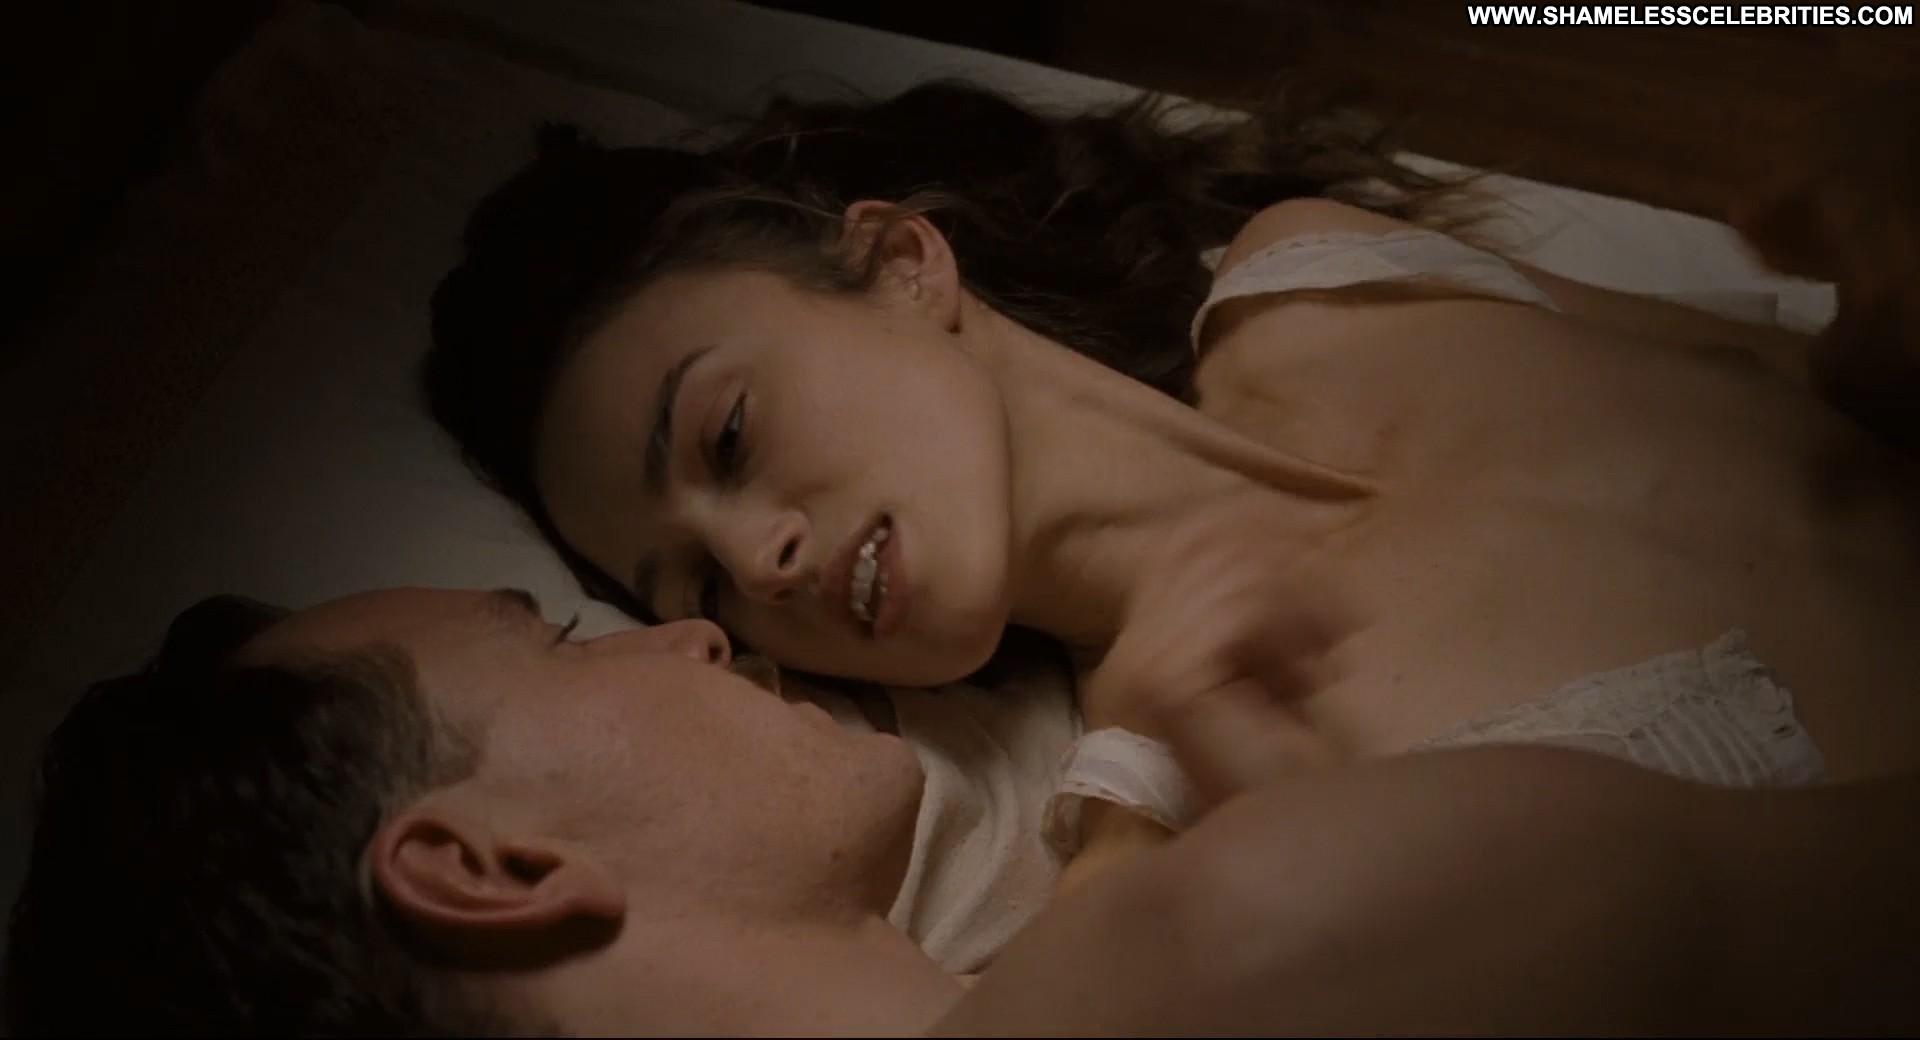 Keira Knightley Anna Thalbach Sarah Marecek A Dangerous ...